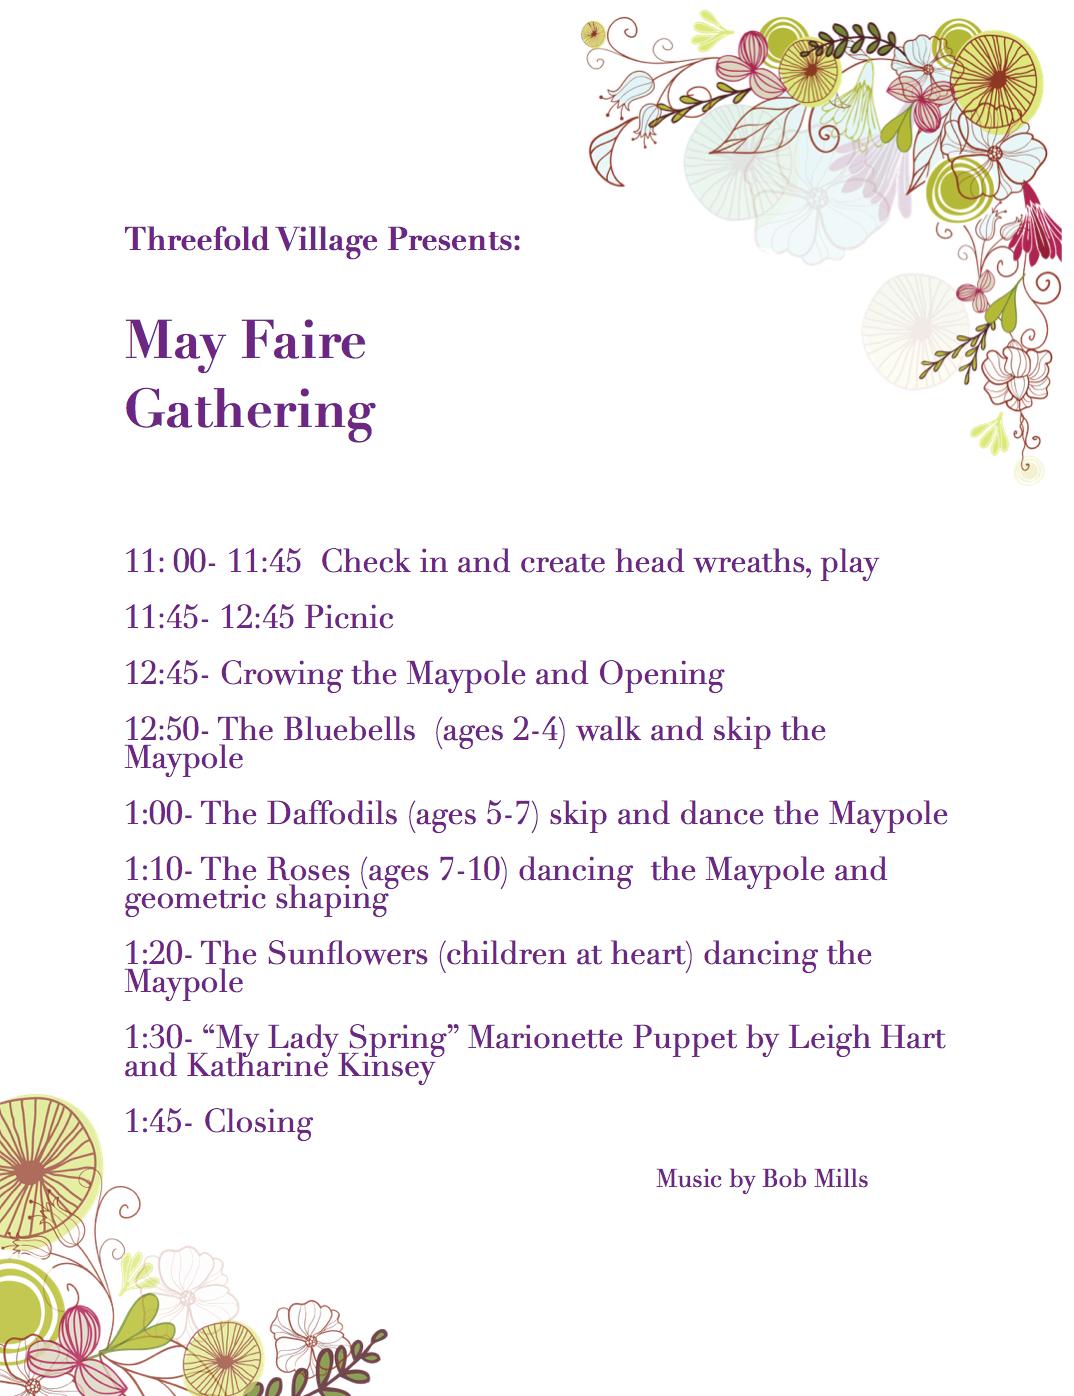 Agenda for Threefold Village May Faire